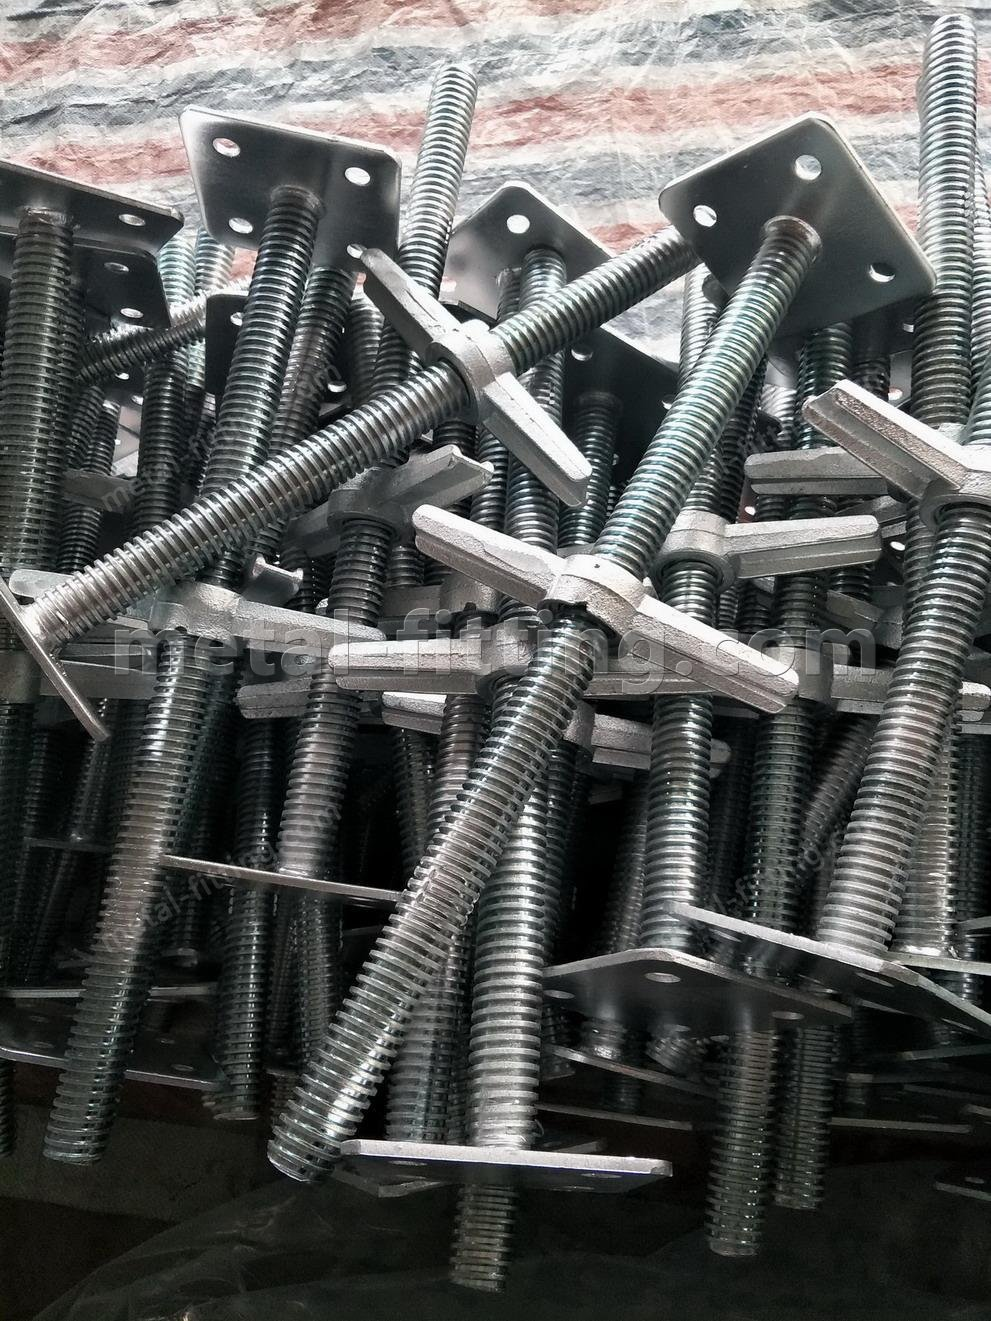 scaffolding standards jack base,scaffolding,scaffold part-scaffold JACK BASE (2)